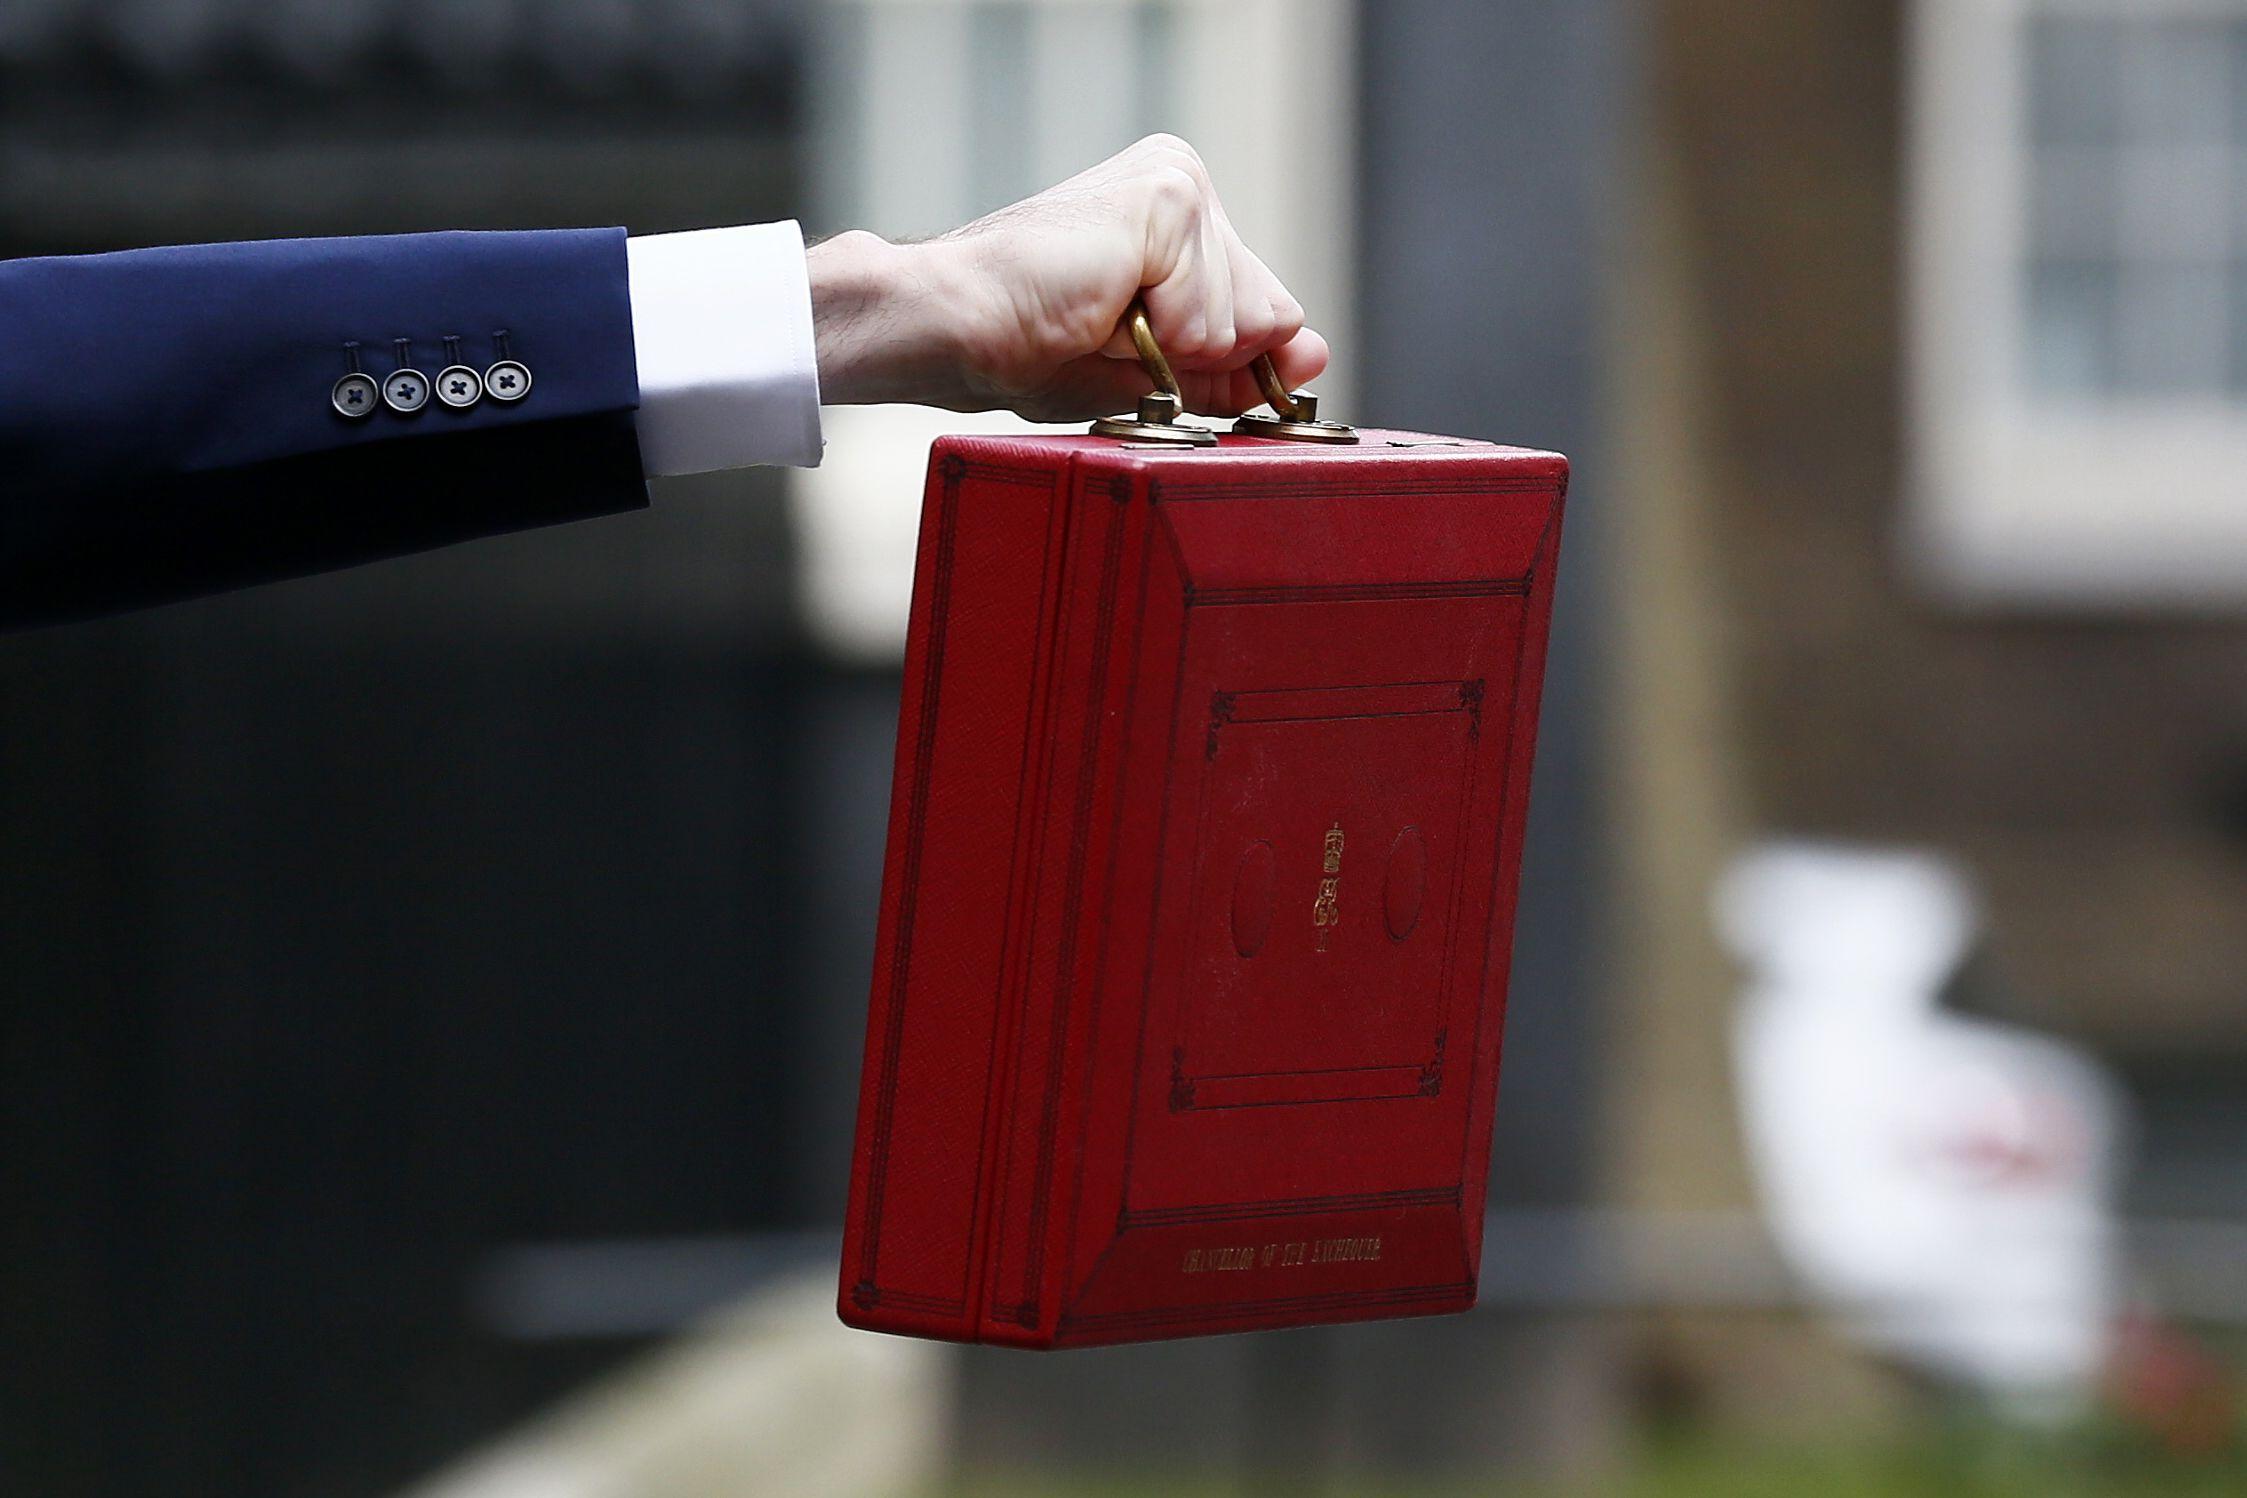 16/03/2016_Budget Red Box